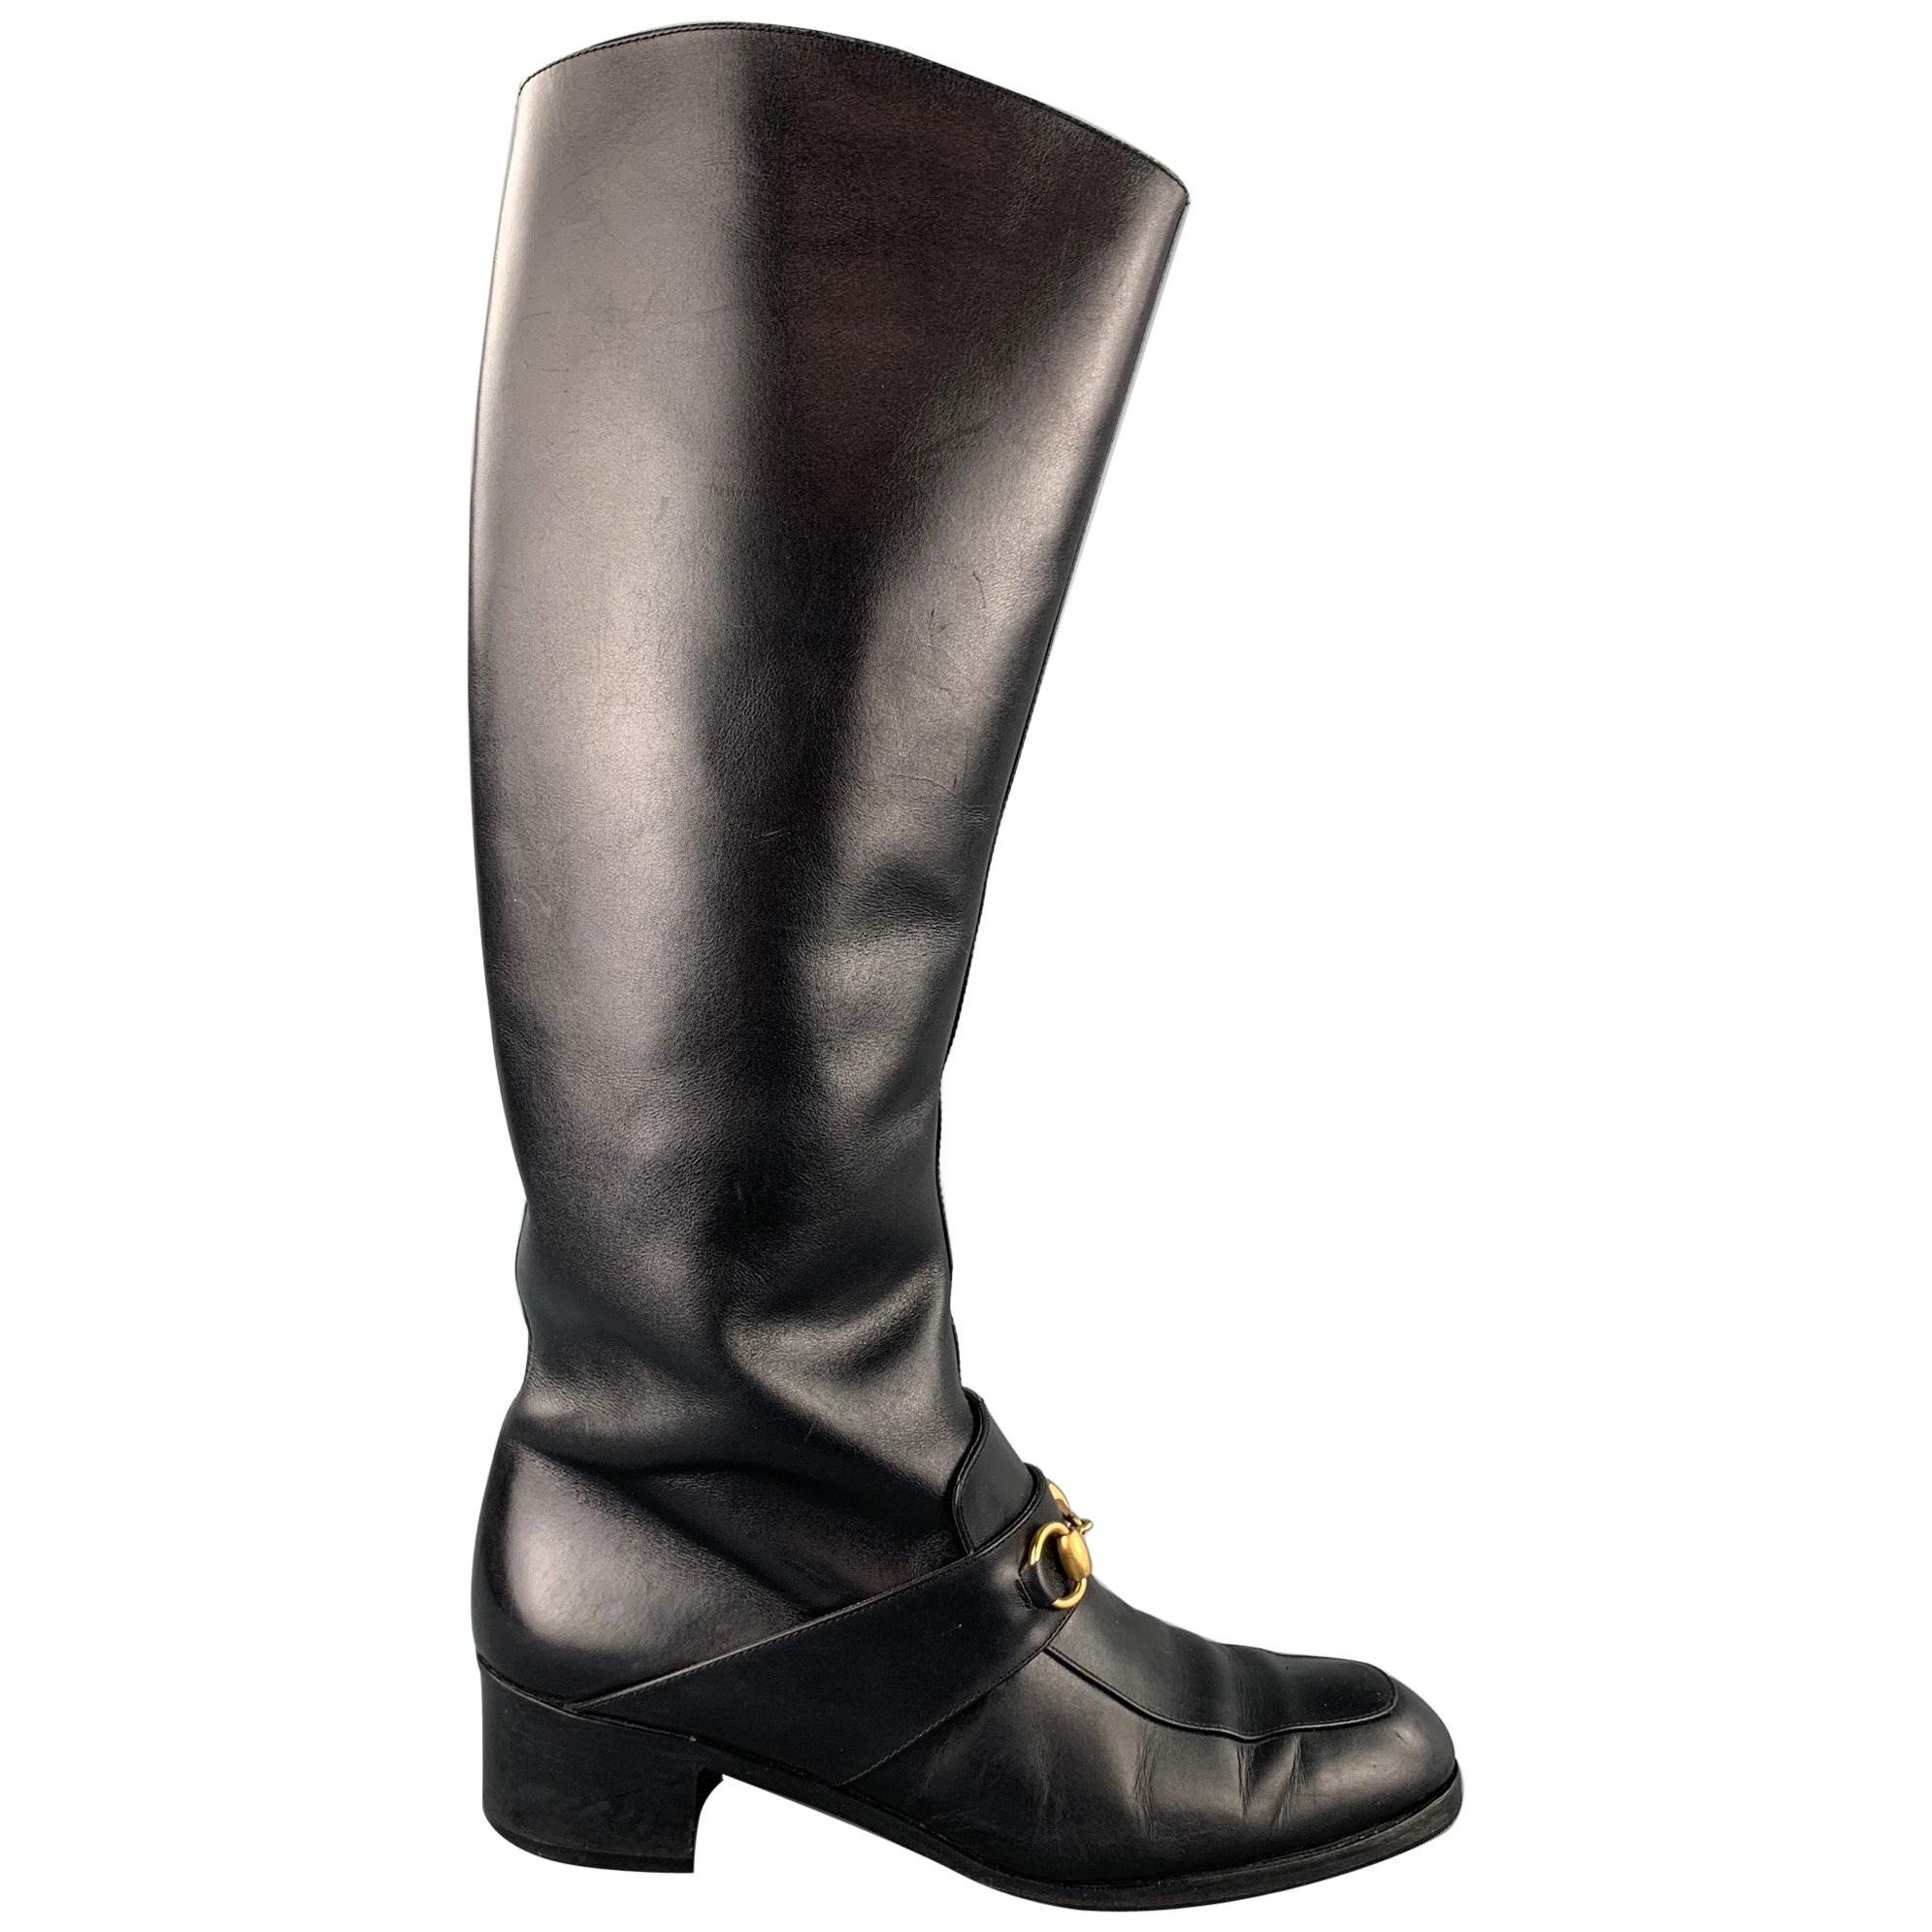 GUCCI Size 10 Black Leather Horsebit Riding Boots